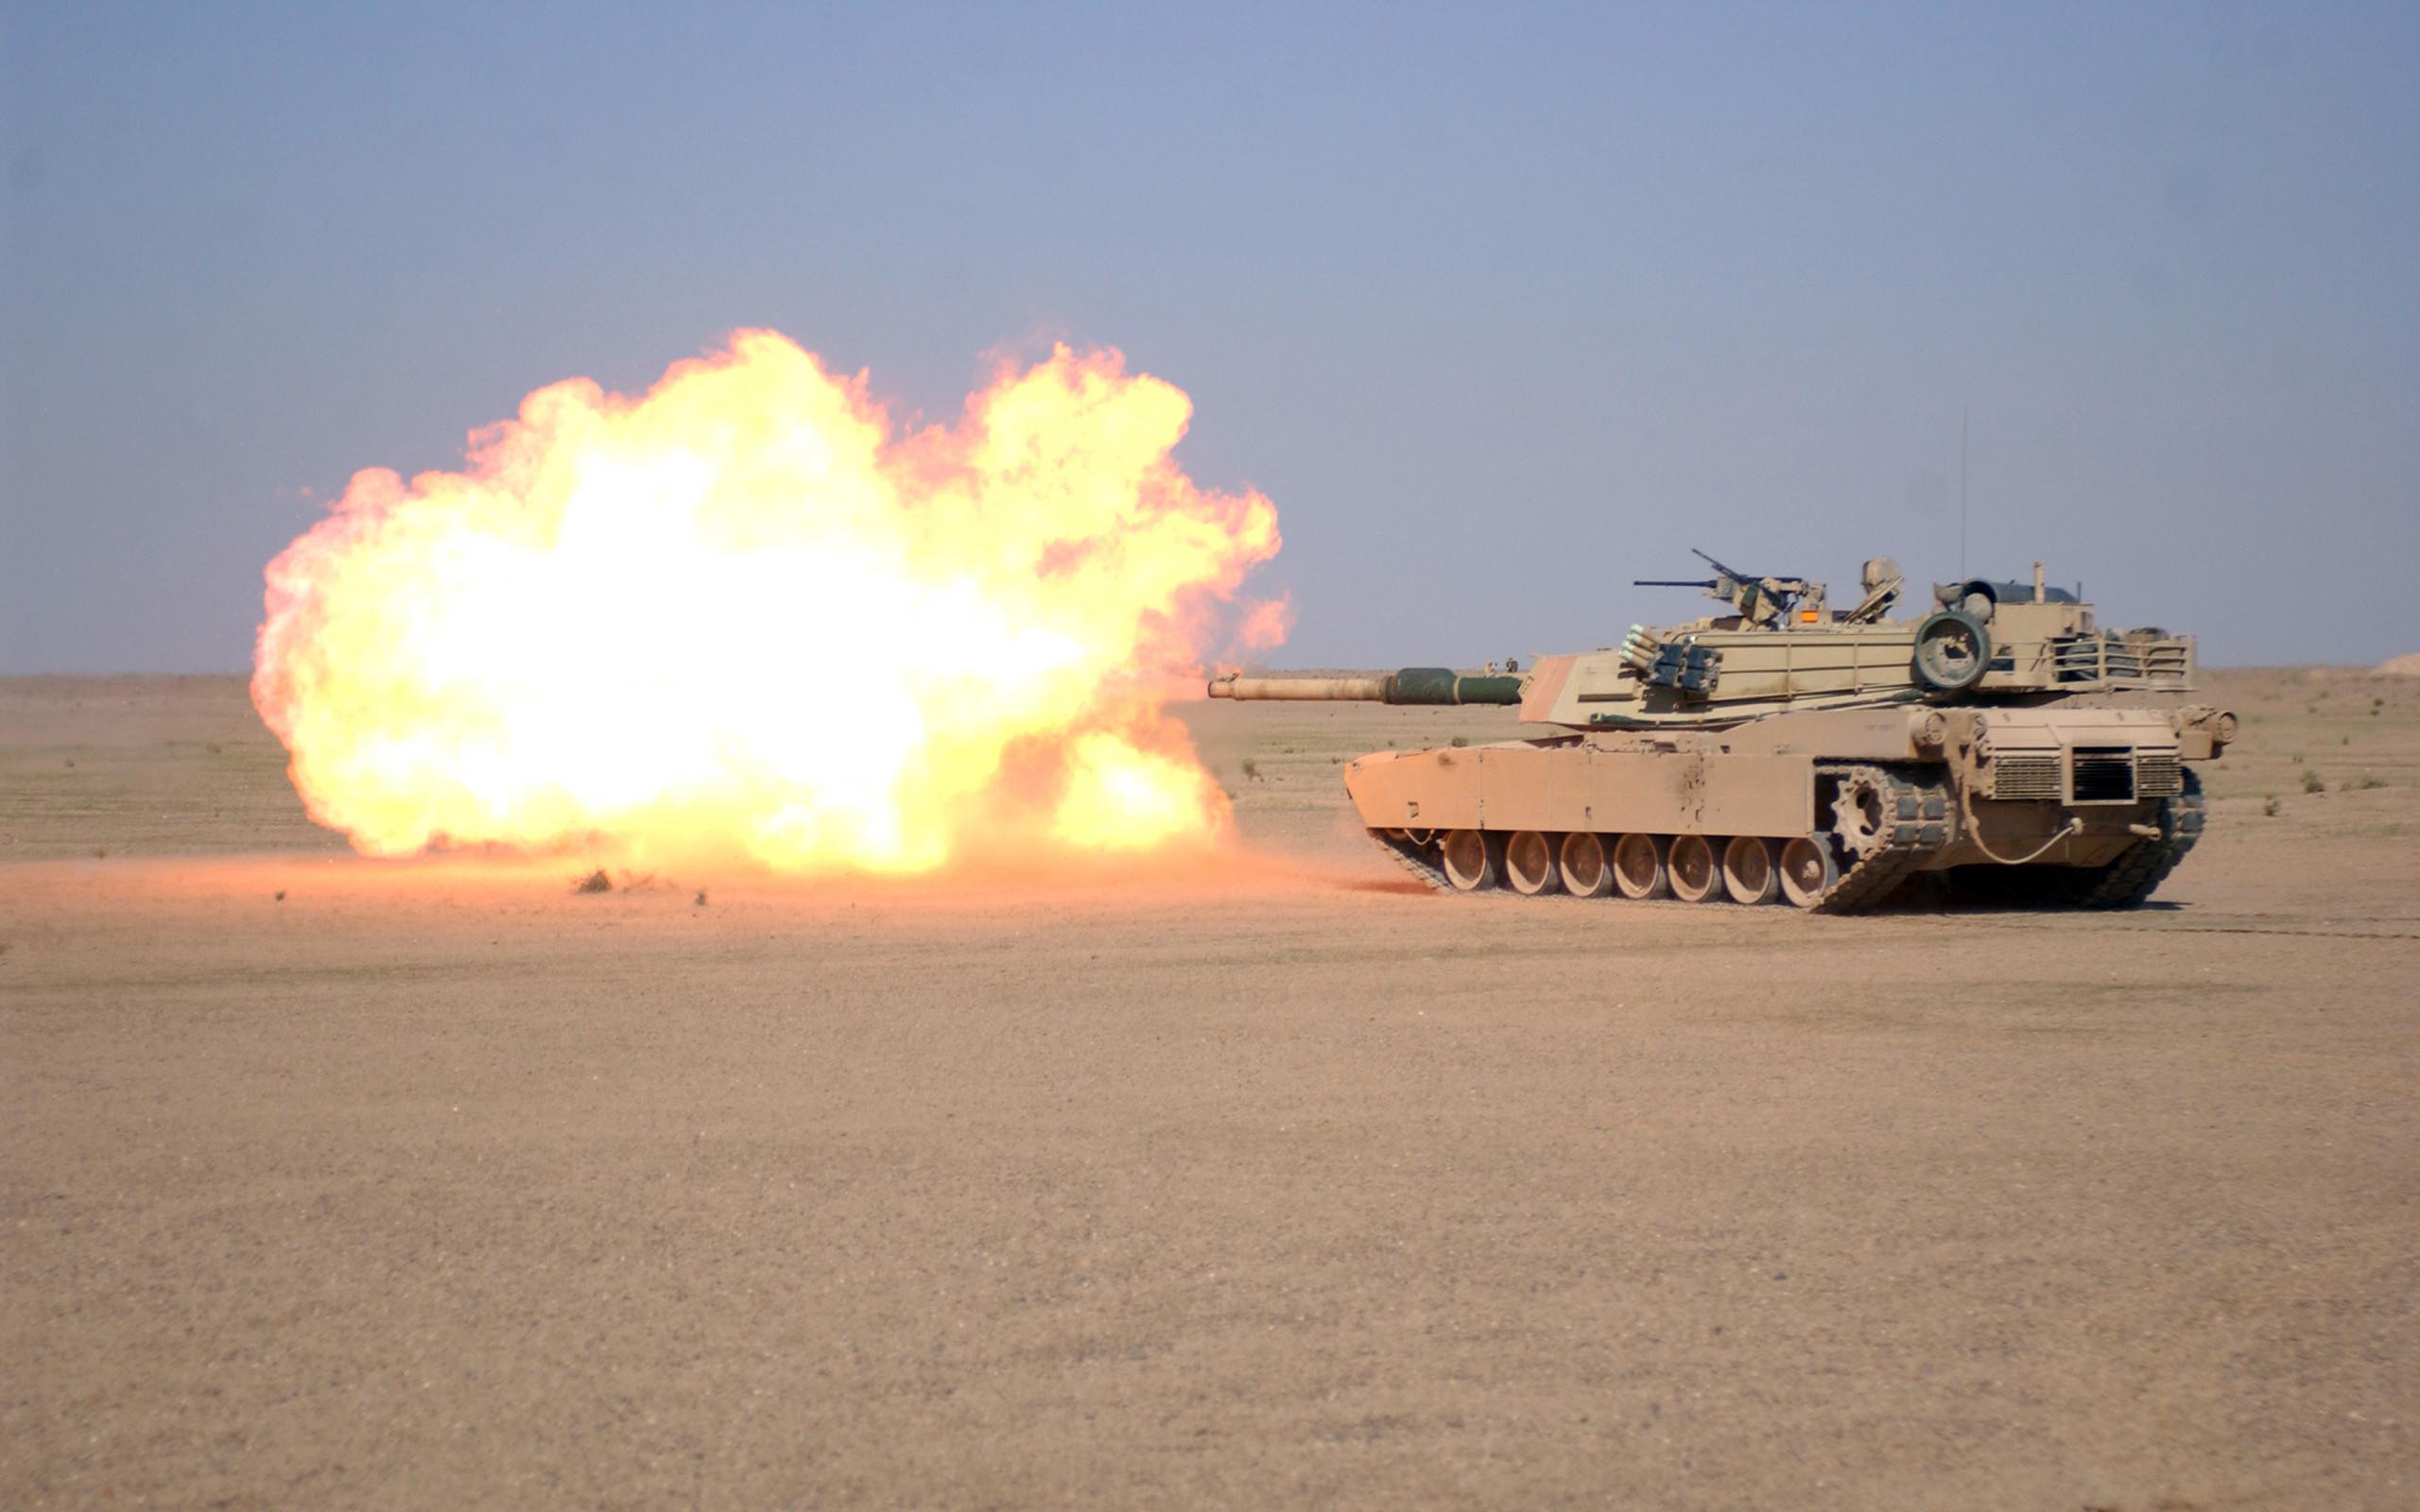 M1A1 Abrams Tank Military Tanks United States Marine Corps 33513 …